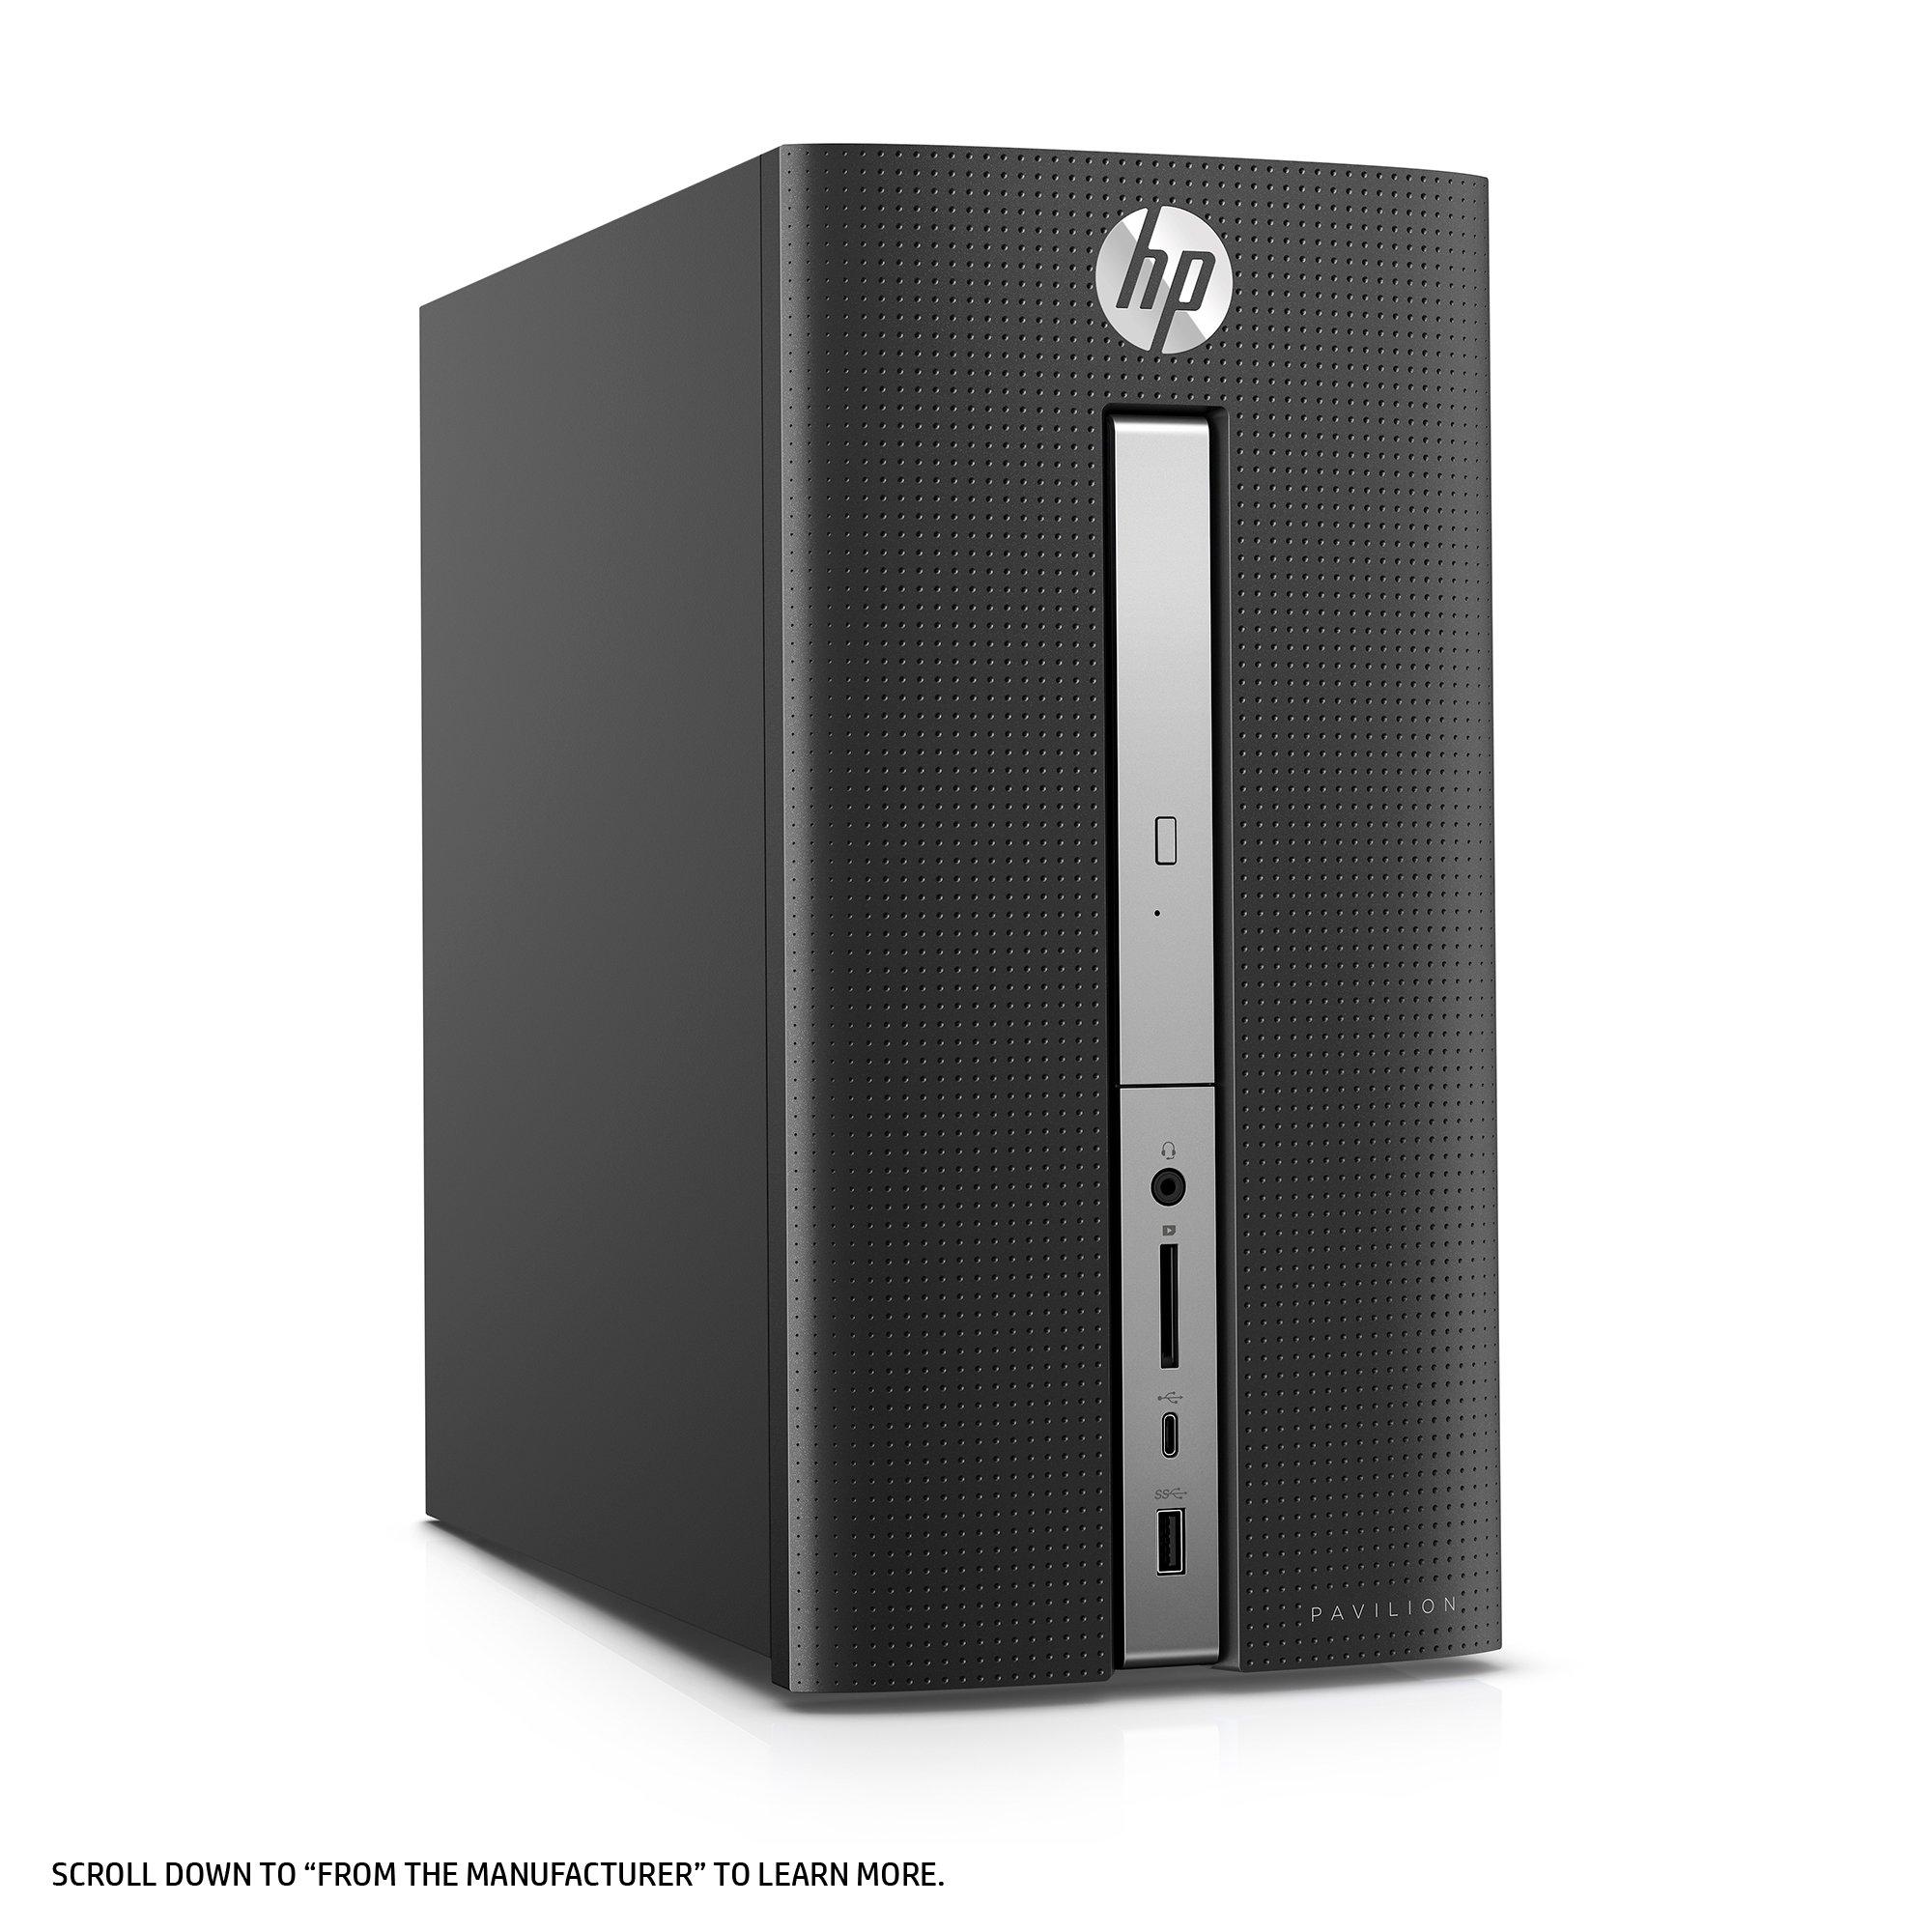 HP Pavilion Desktop Computer, Intel Core i7-7700, 12GB RAM, 1TB hard drive, Windows 10 (570-p030, Black) by HP (Image #4)